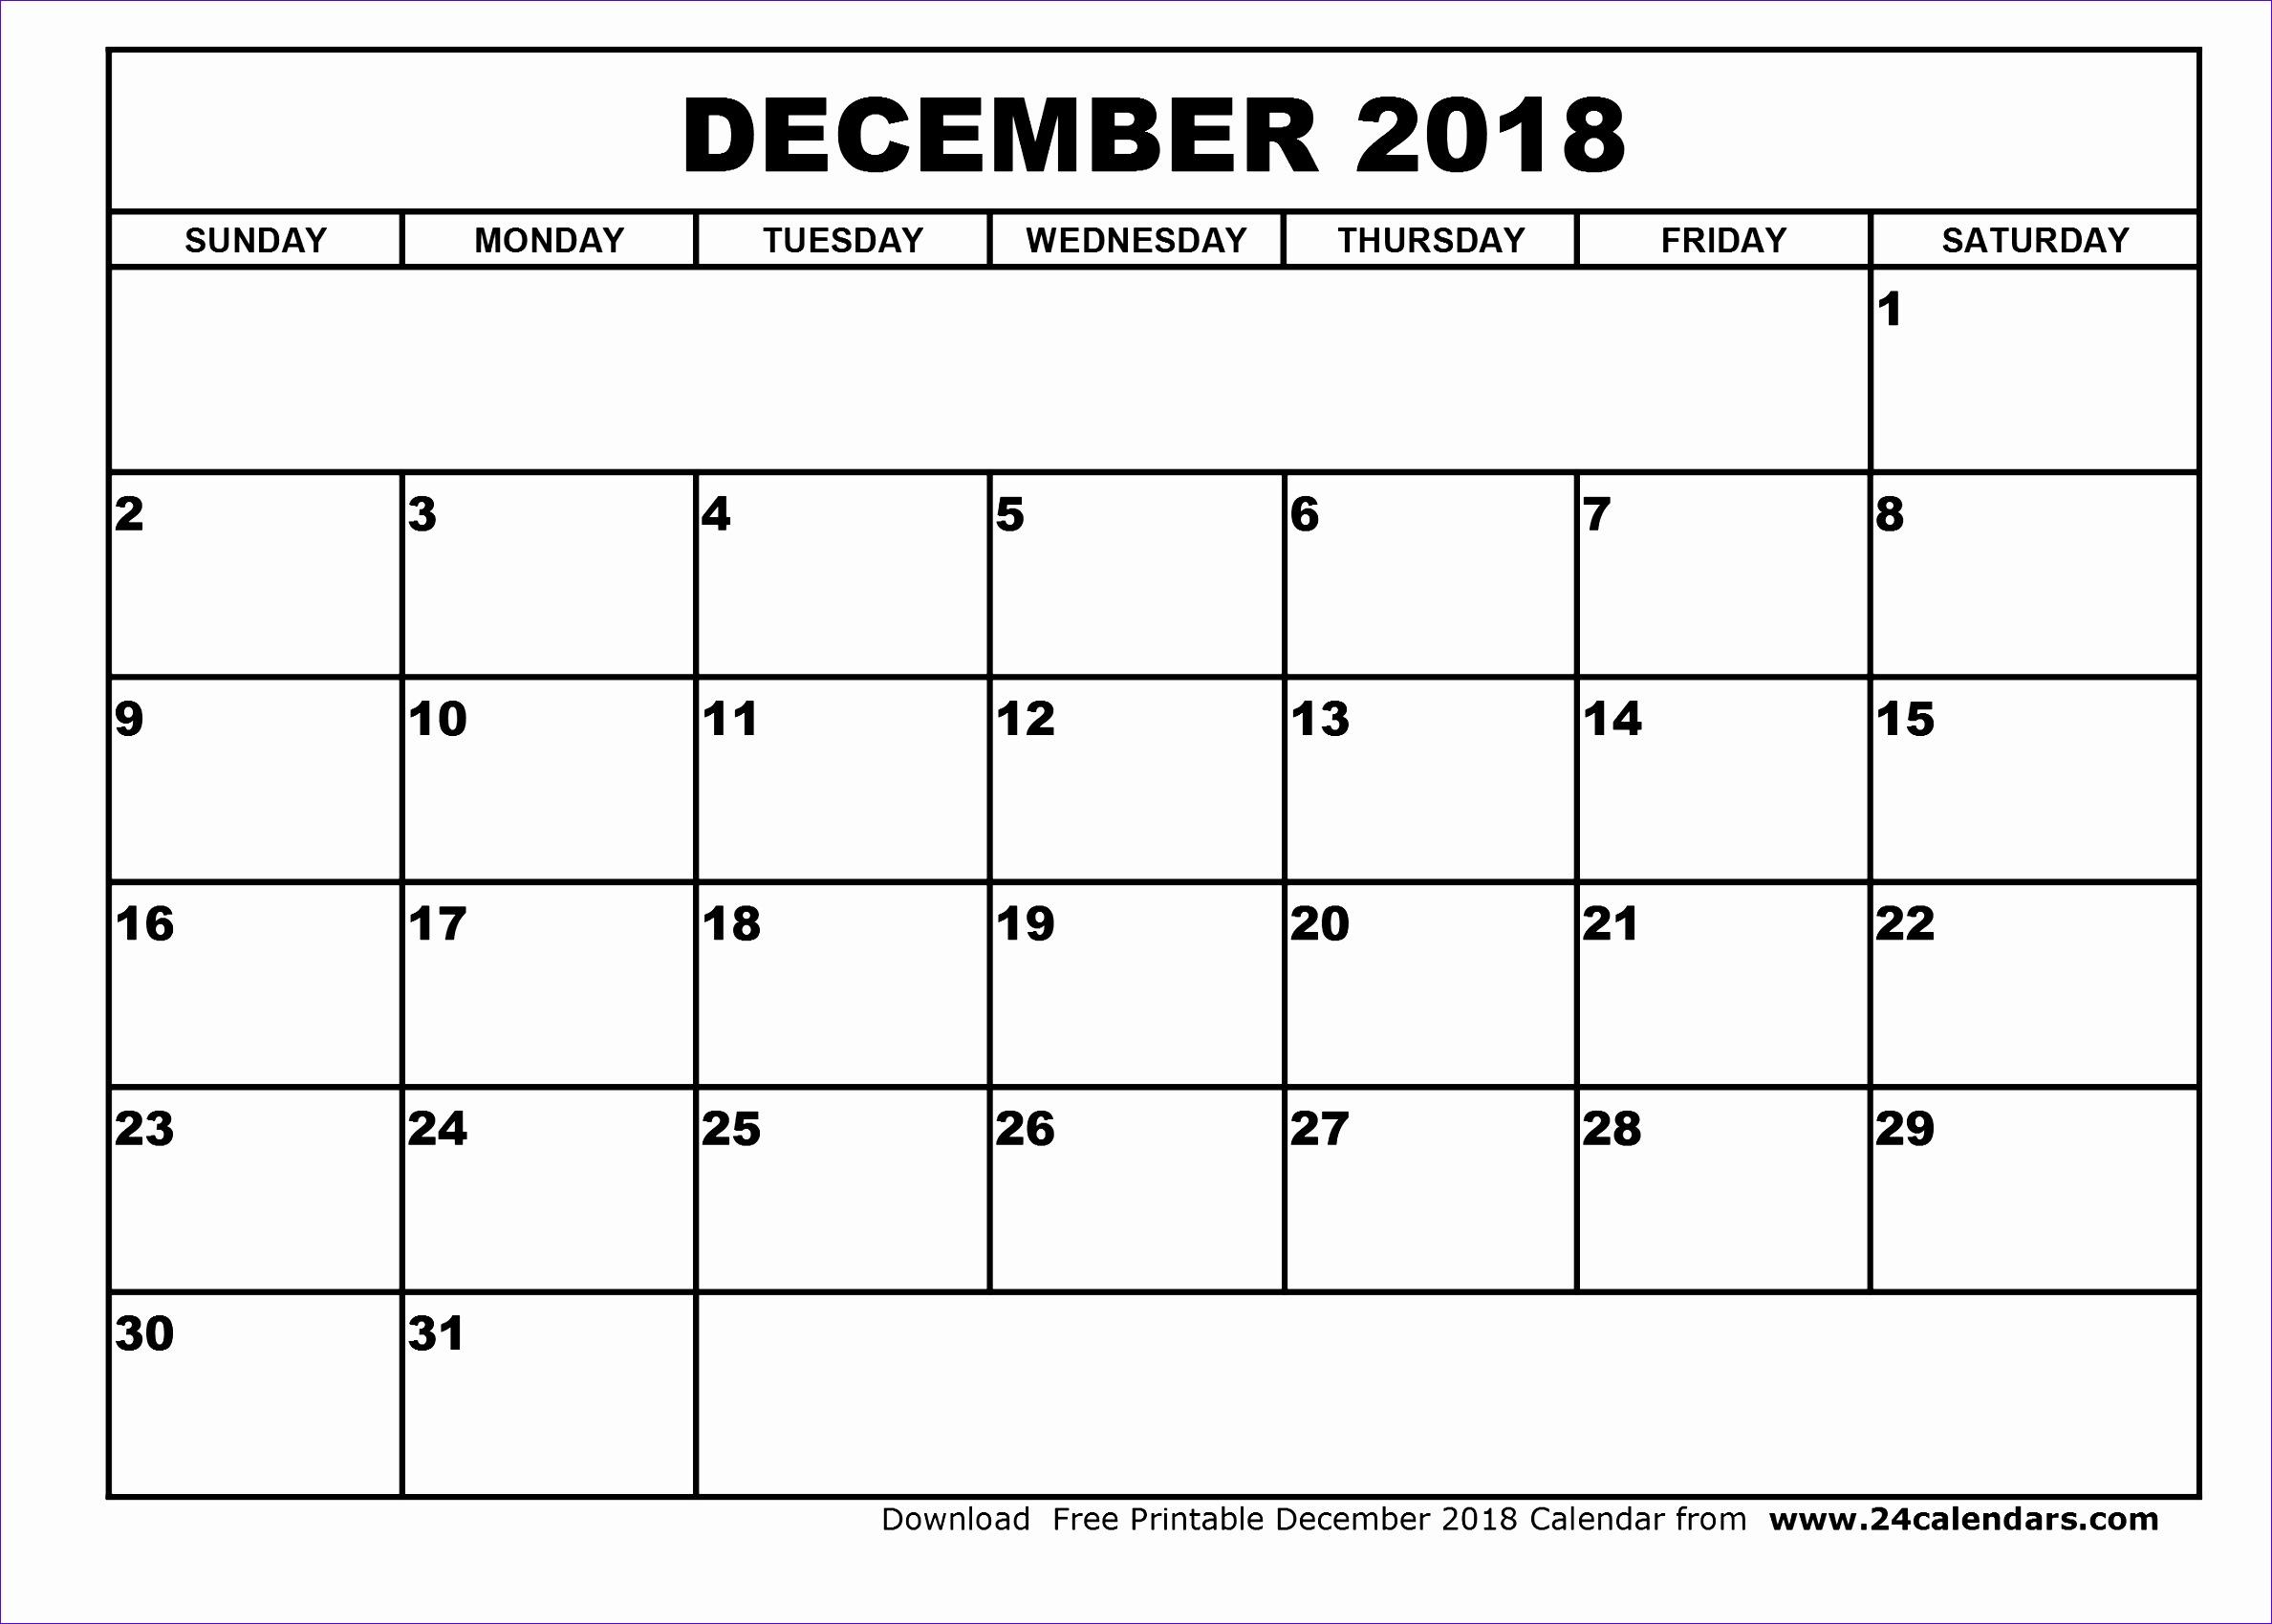 december 2018 calendar pdf 3272 23771699